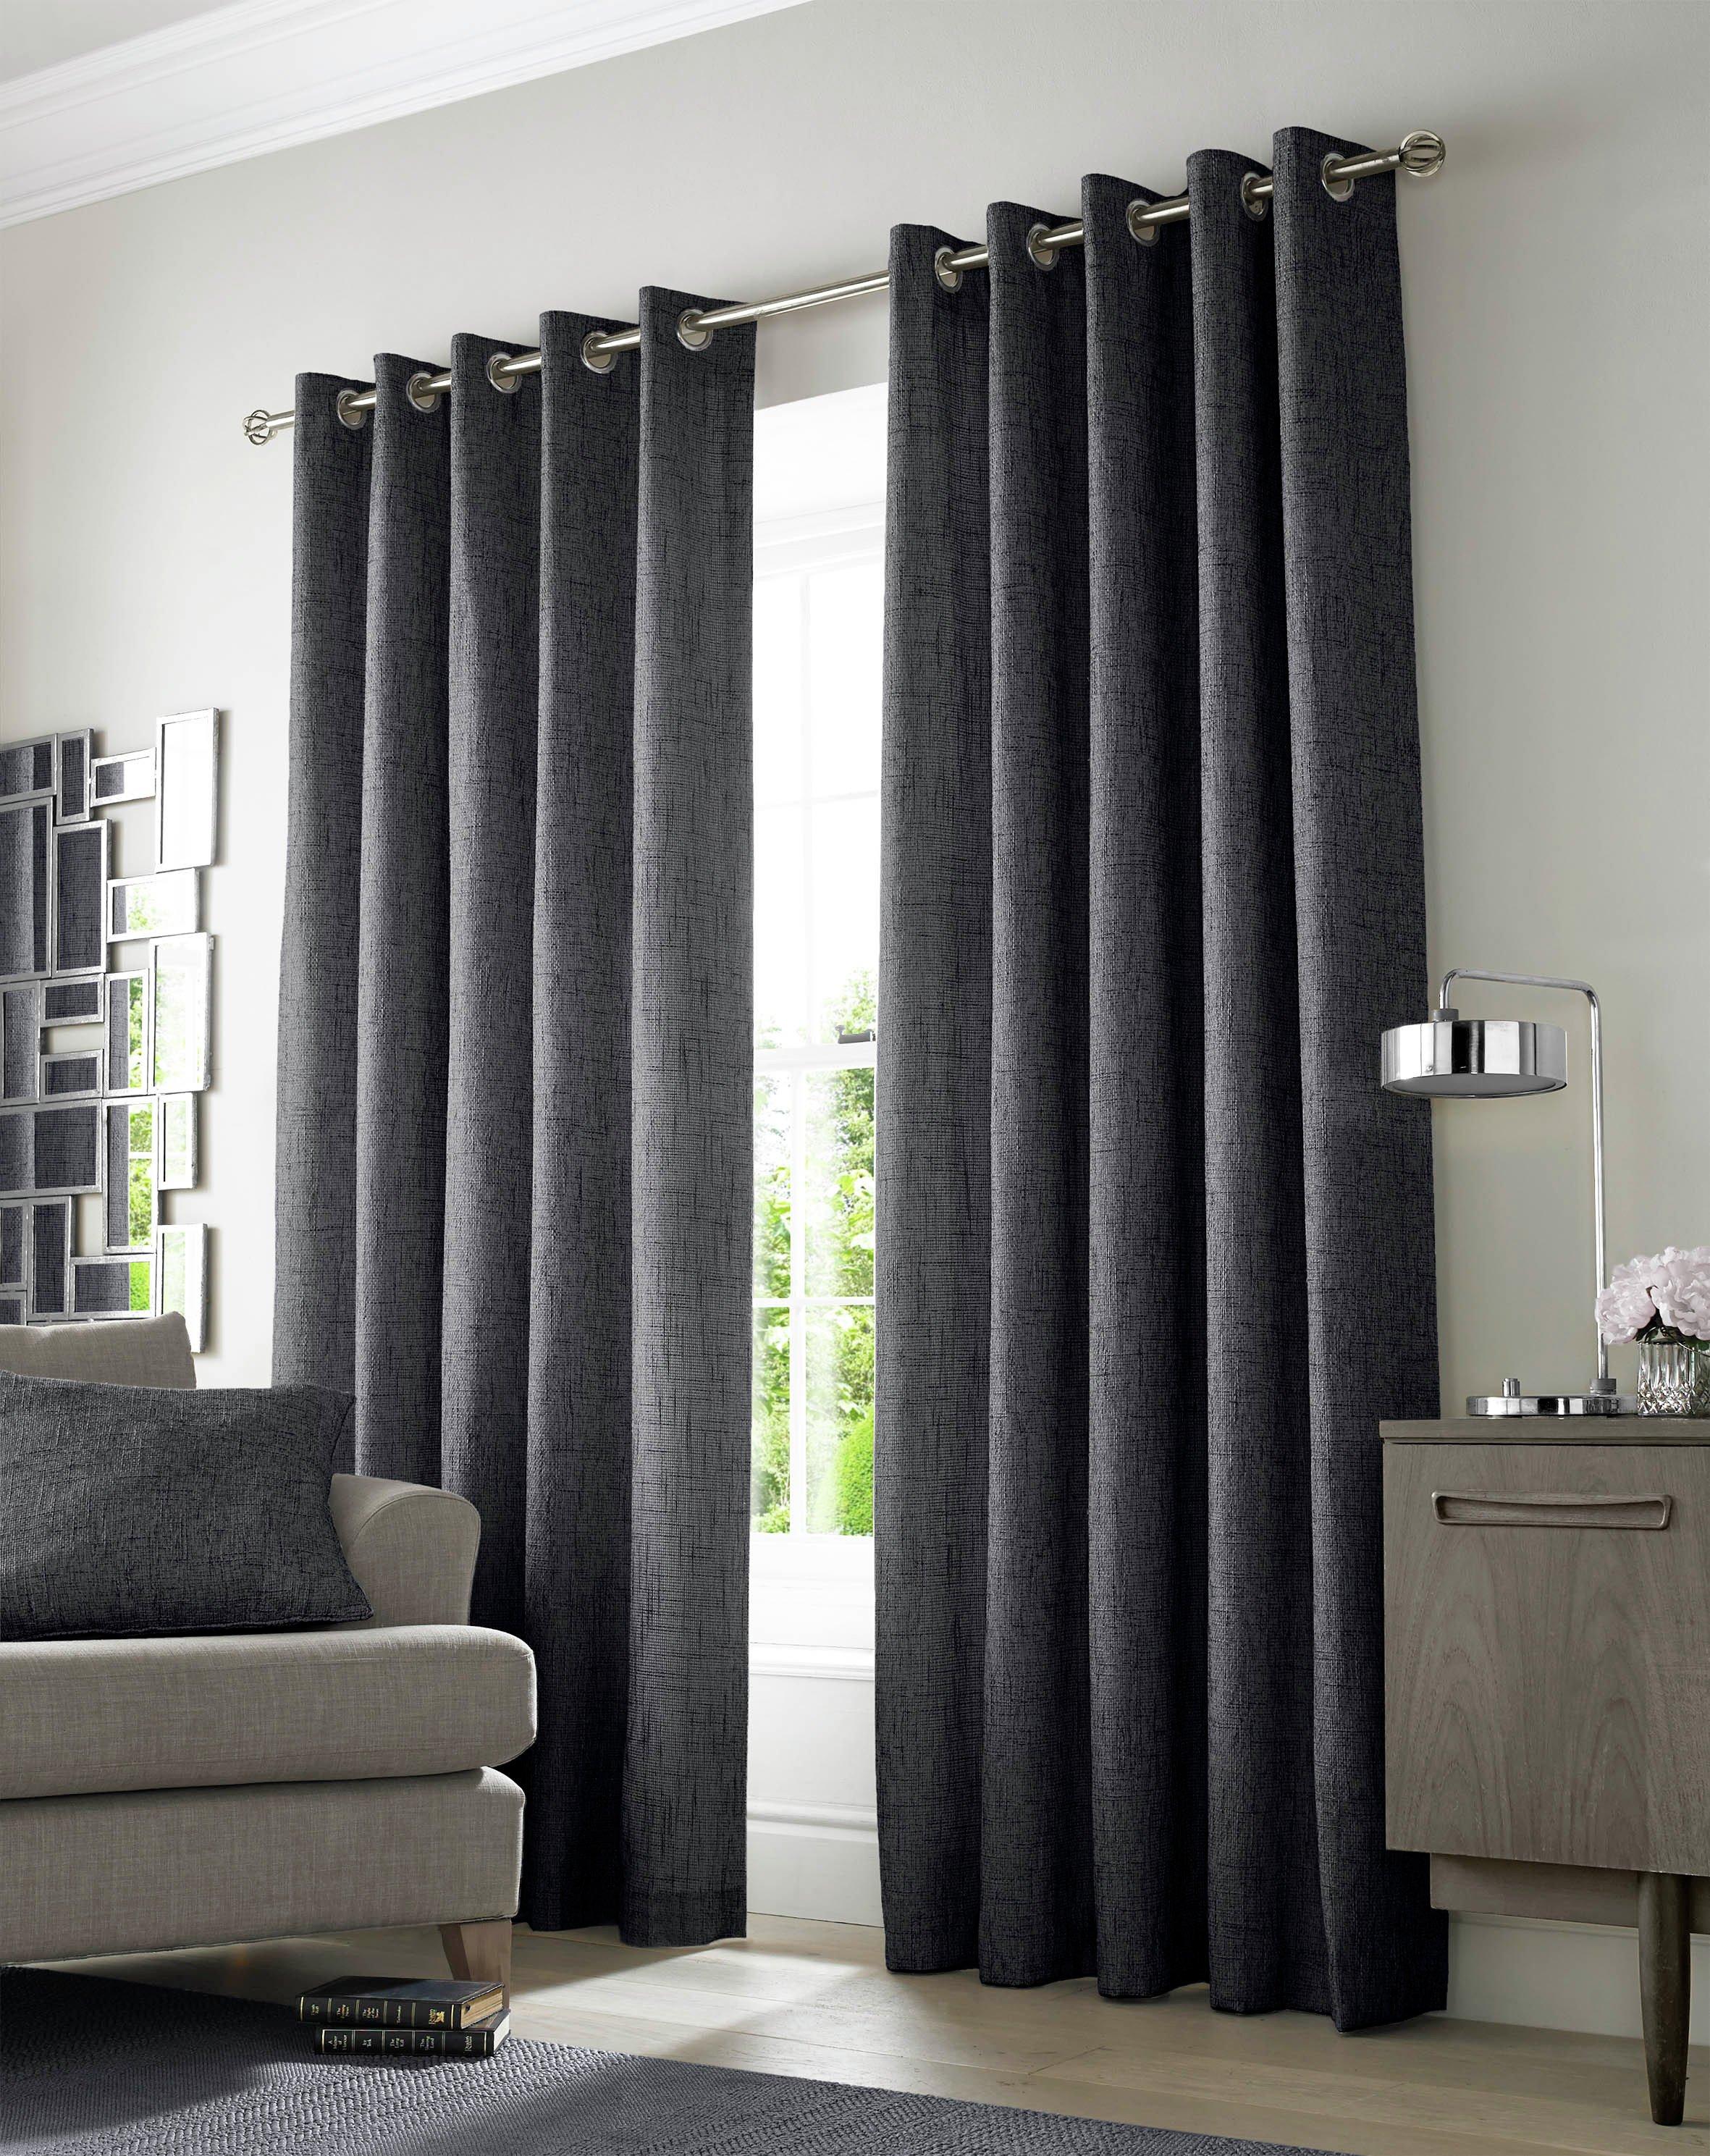 Academy Eyelet Curtains - 117x137cm - Charcoal.